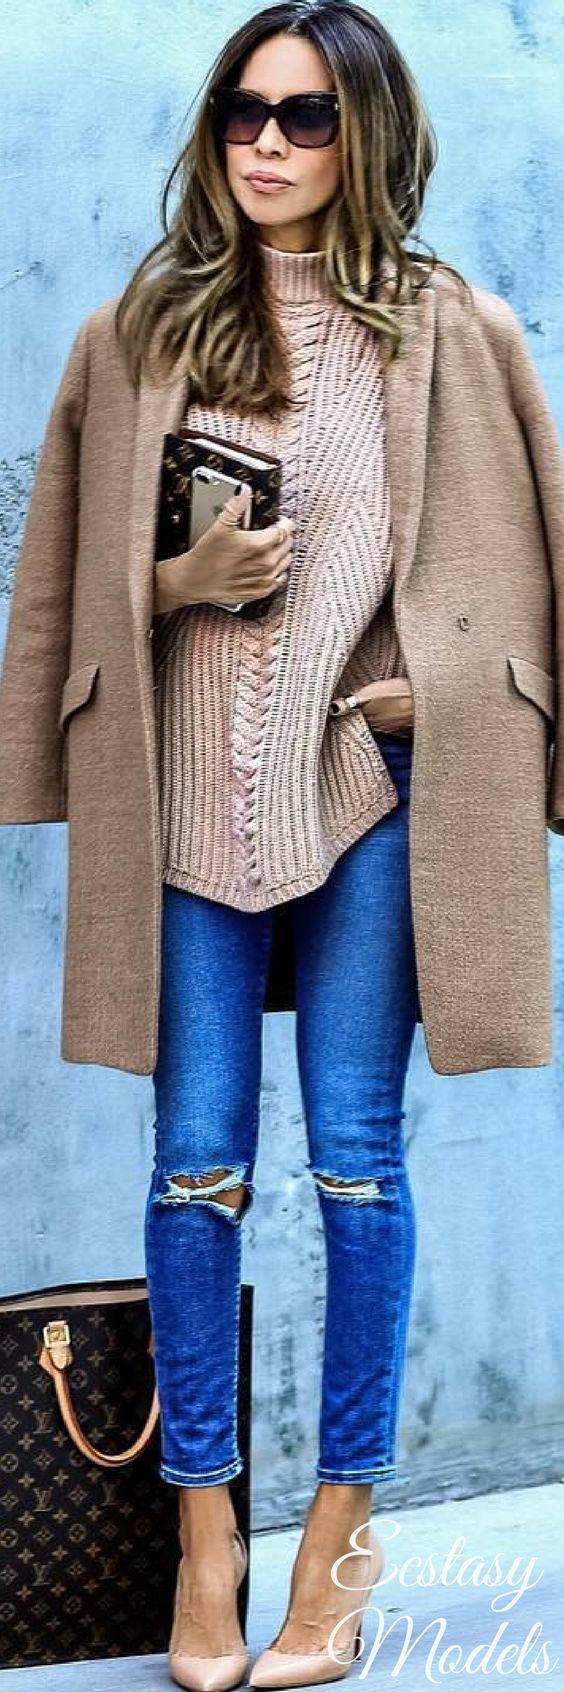 Fall Layers // Fashion Look by Sasha Simon